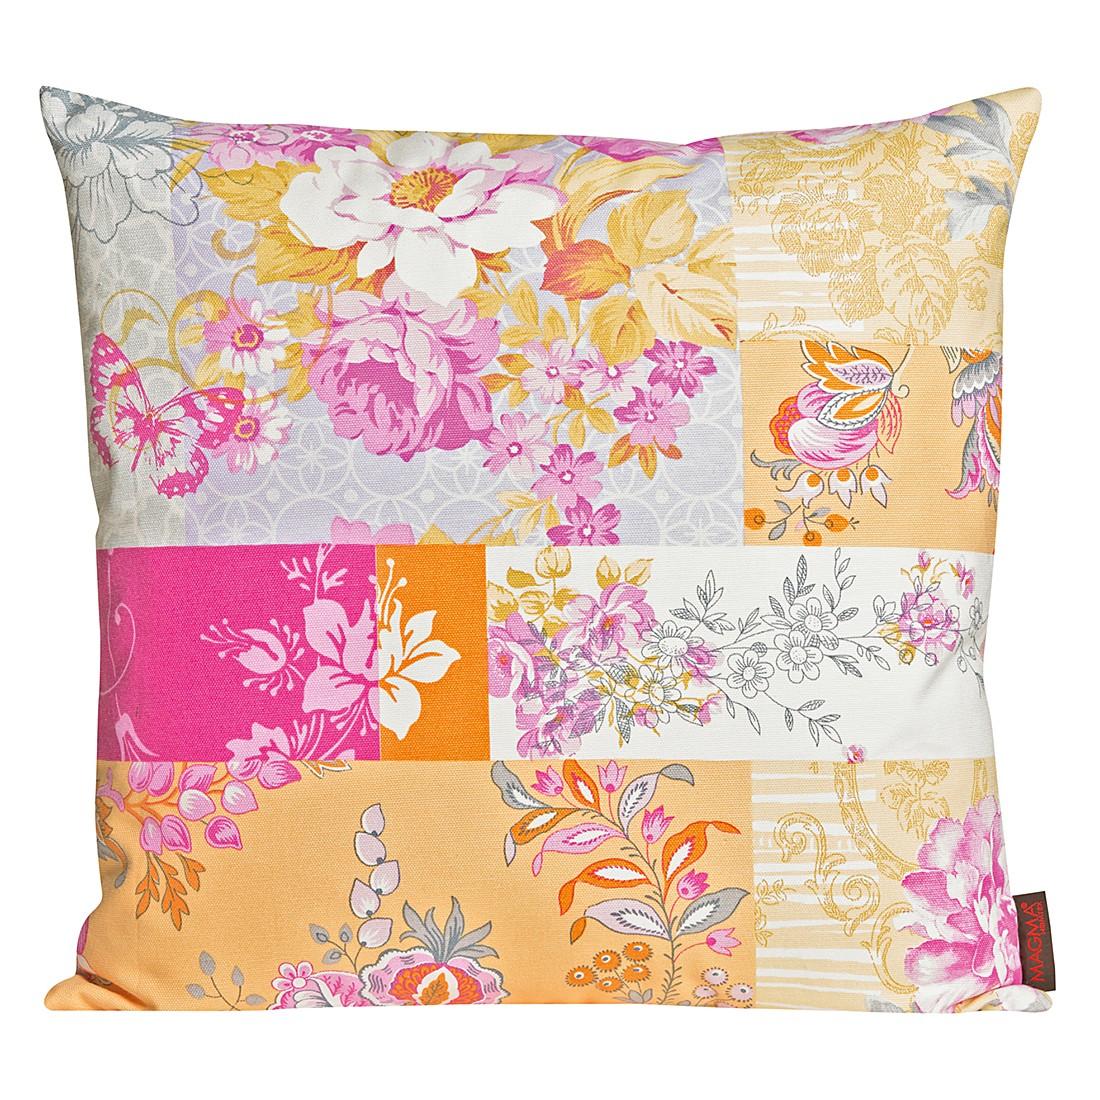 Kissenhülle Fleur II – Orange – Maße: 40 x 40 cm, Magma-Heimtex günstig